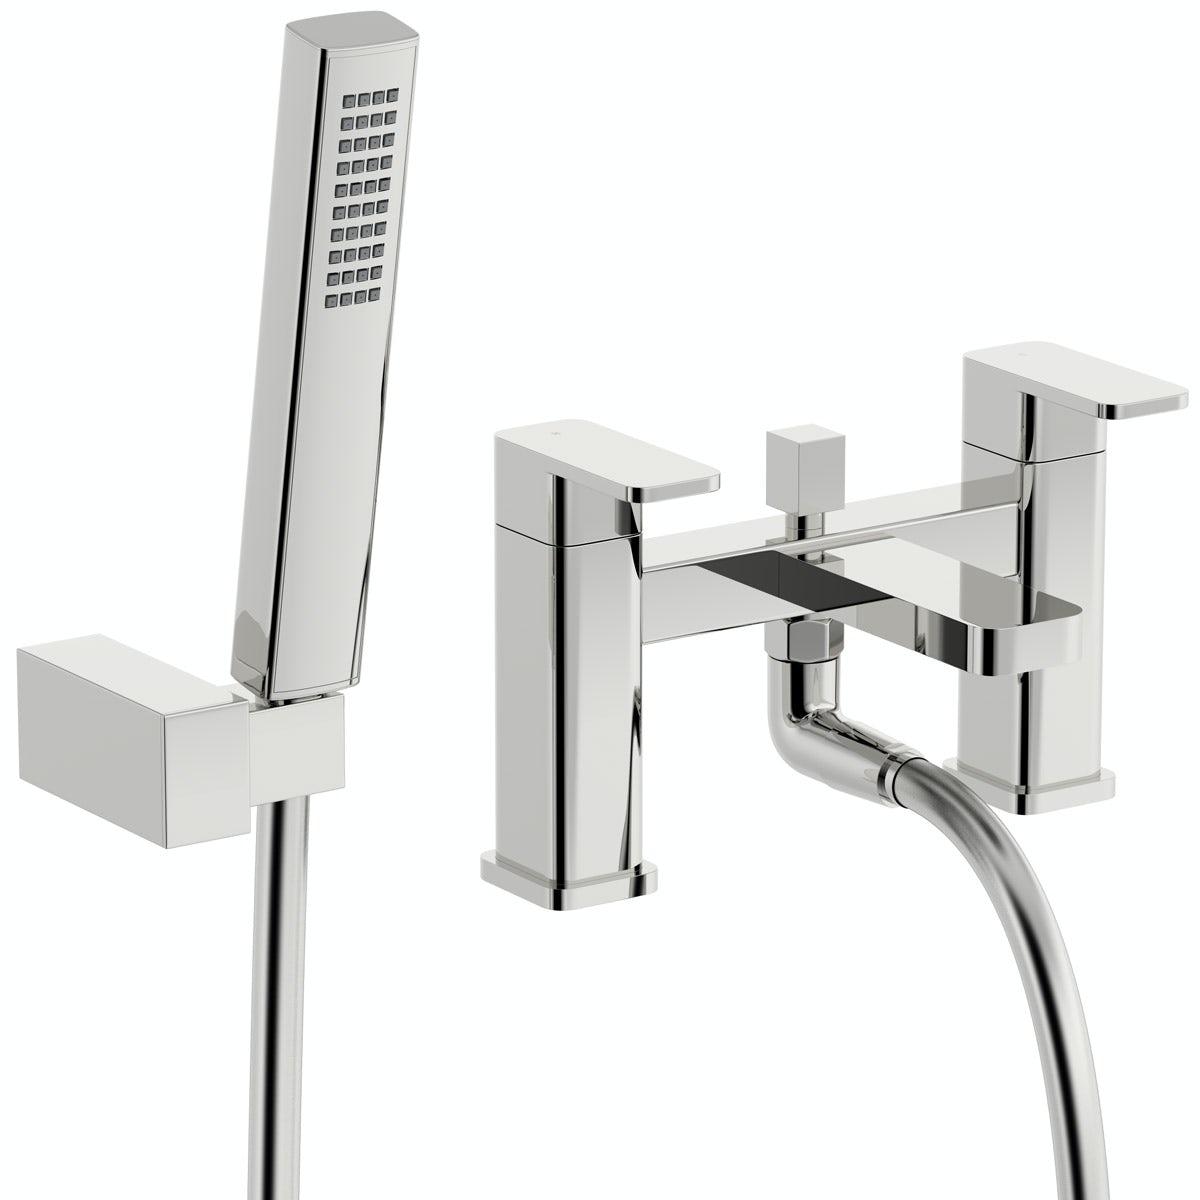 Kirke Connect bath shower mixer tap